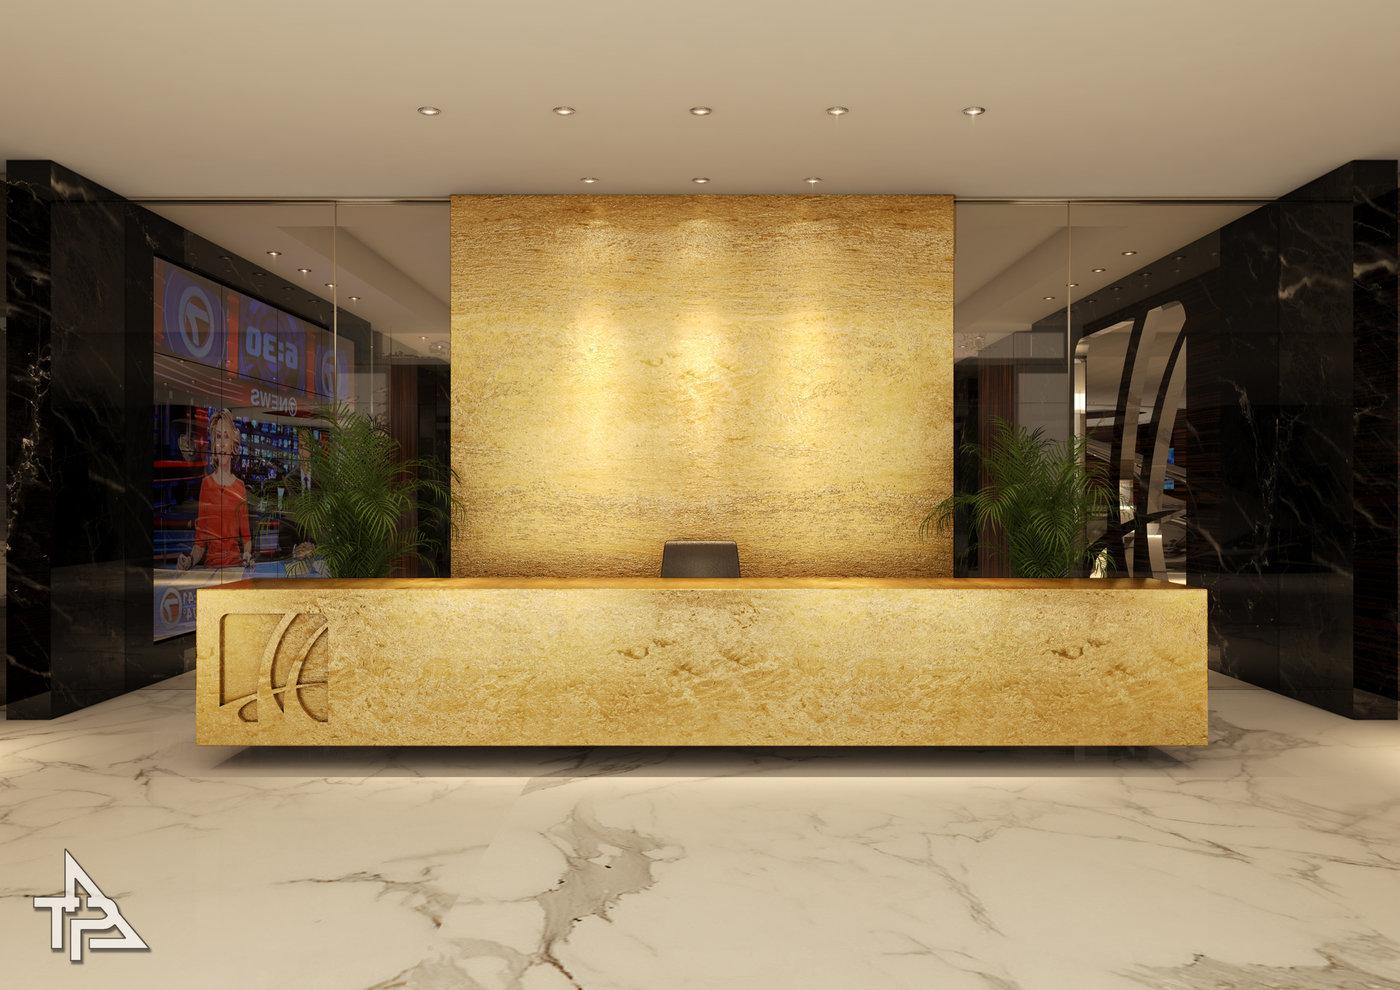 Commercial Interior Design By Malvi Thakur At Coroflot Com